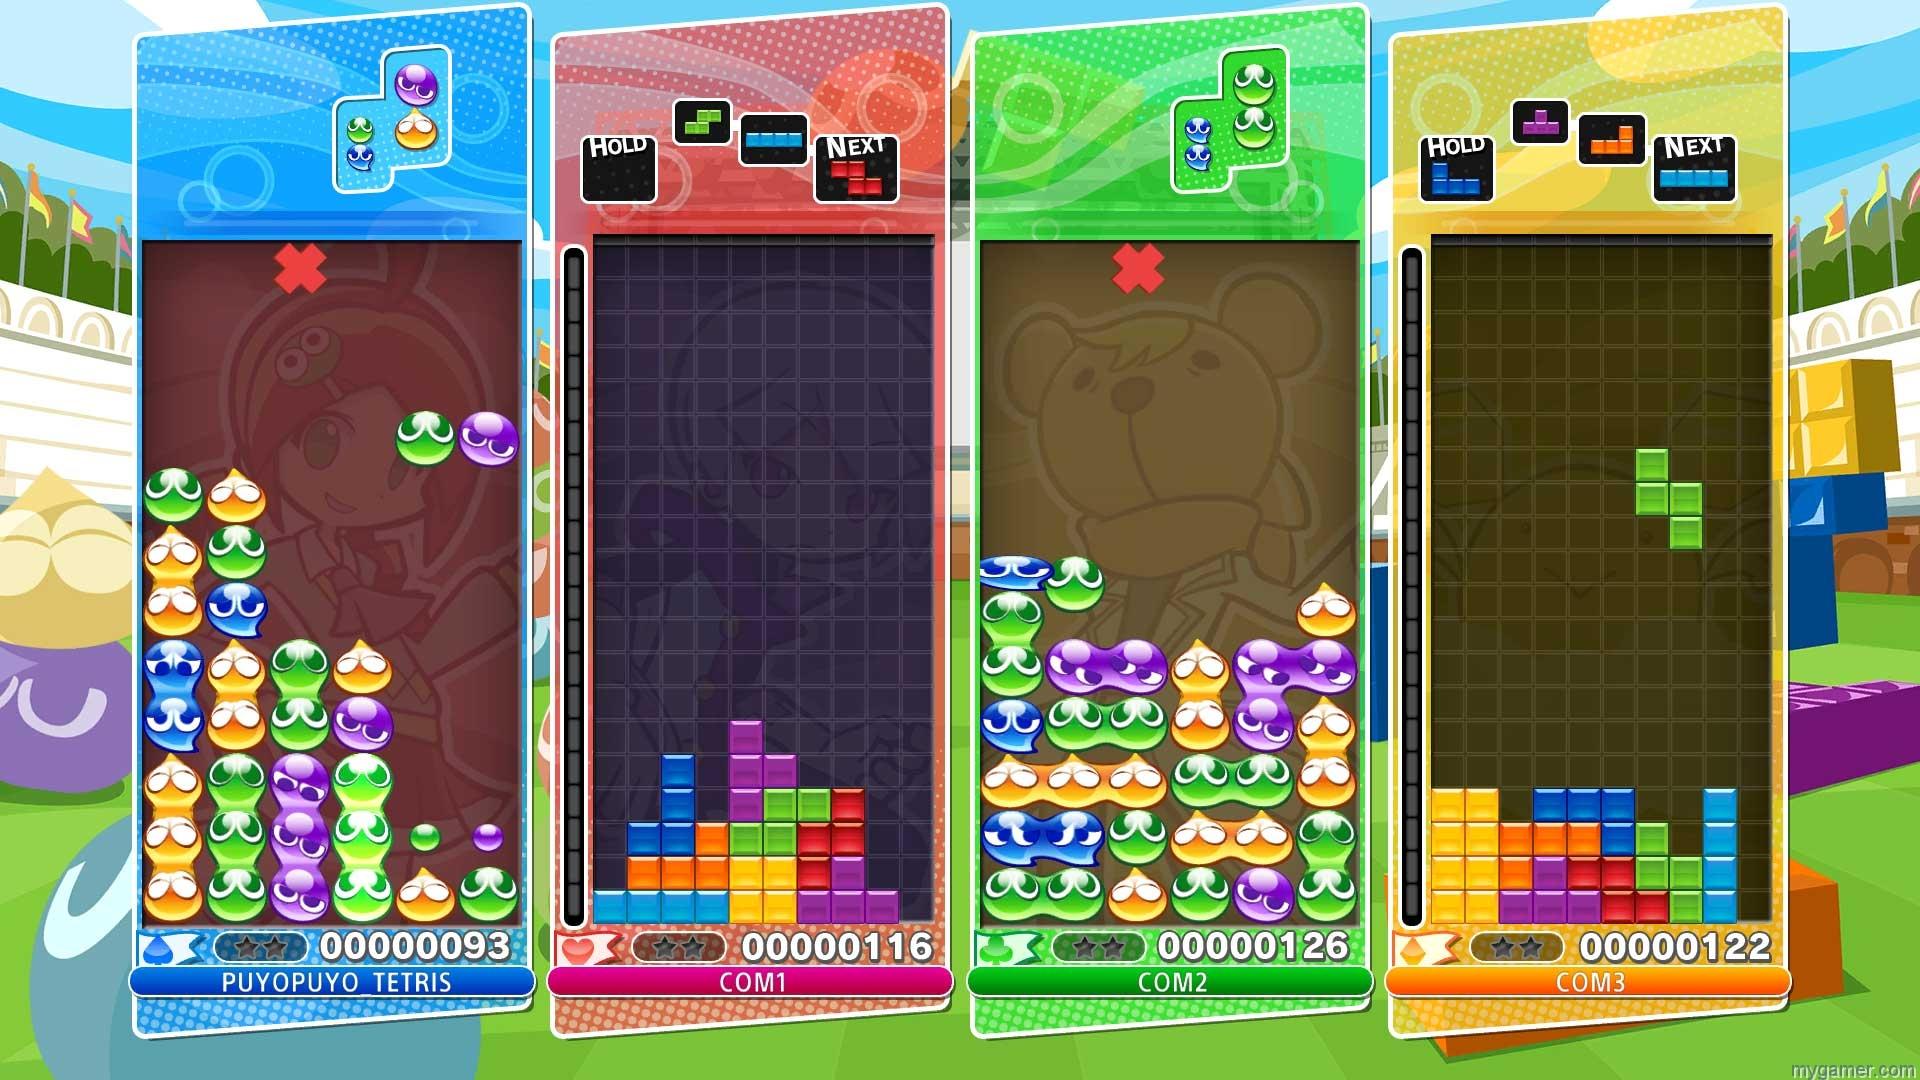 puyo puyo tetris ps4 review Puyo Puyo Tetris PS4 Review puyo puyo tetris 4player